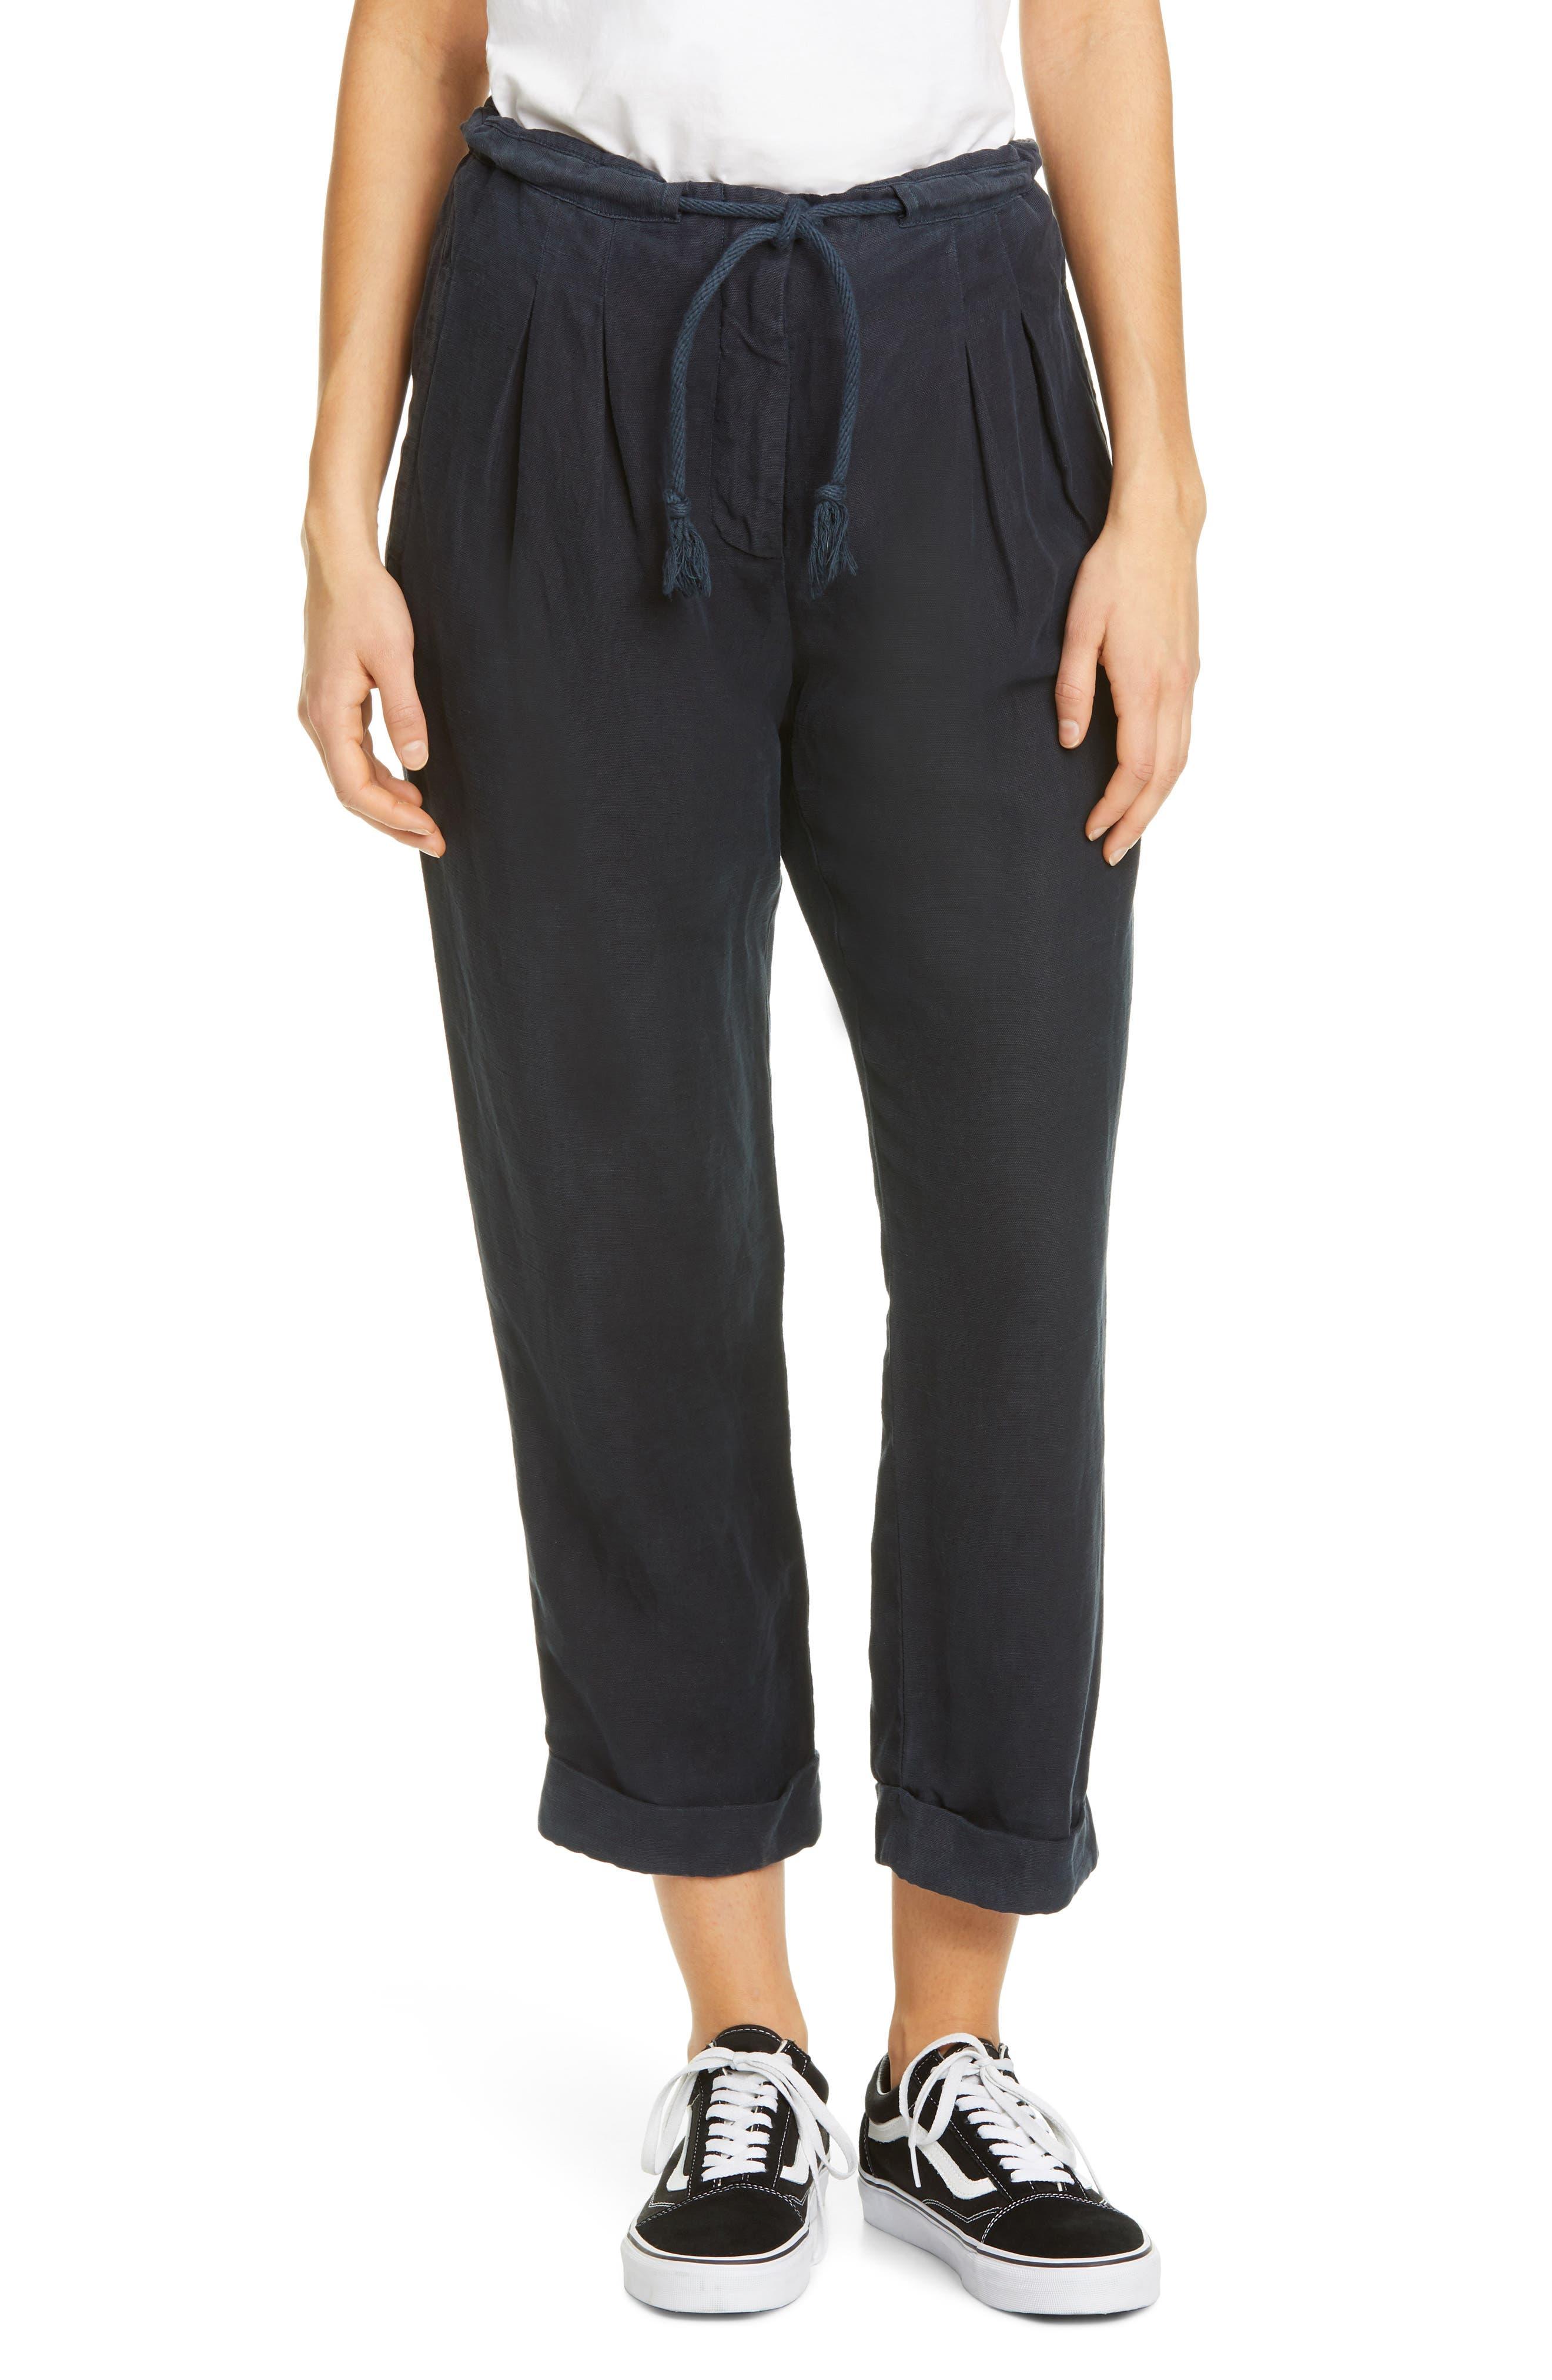 Image of NSF CLOTHING Viola Pleated Pants